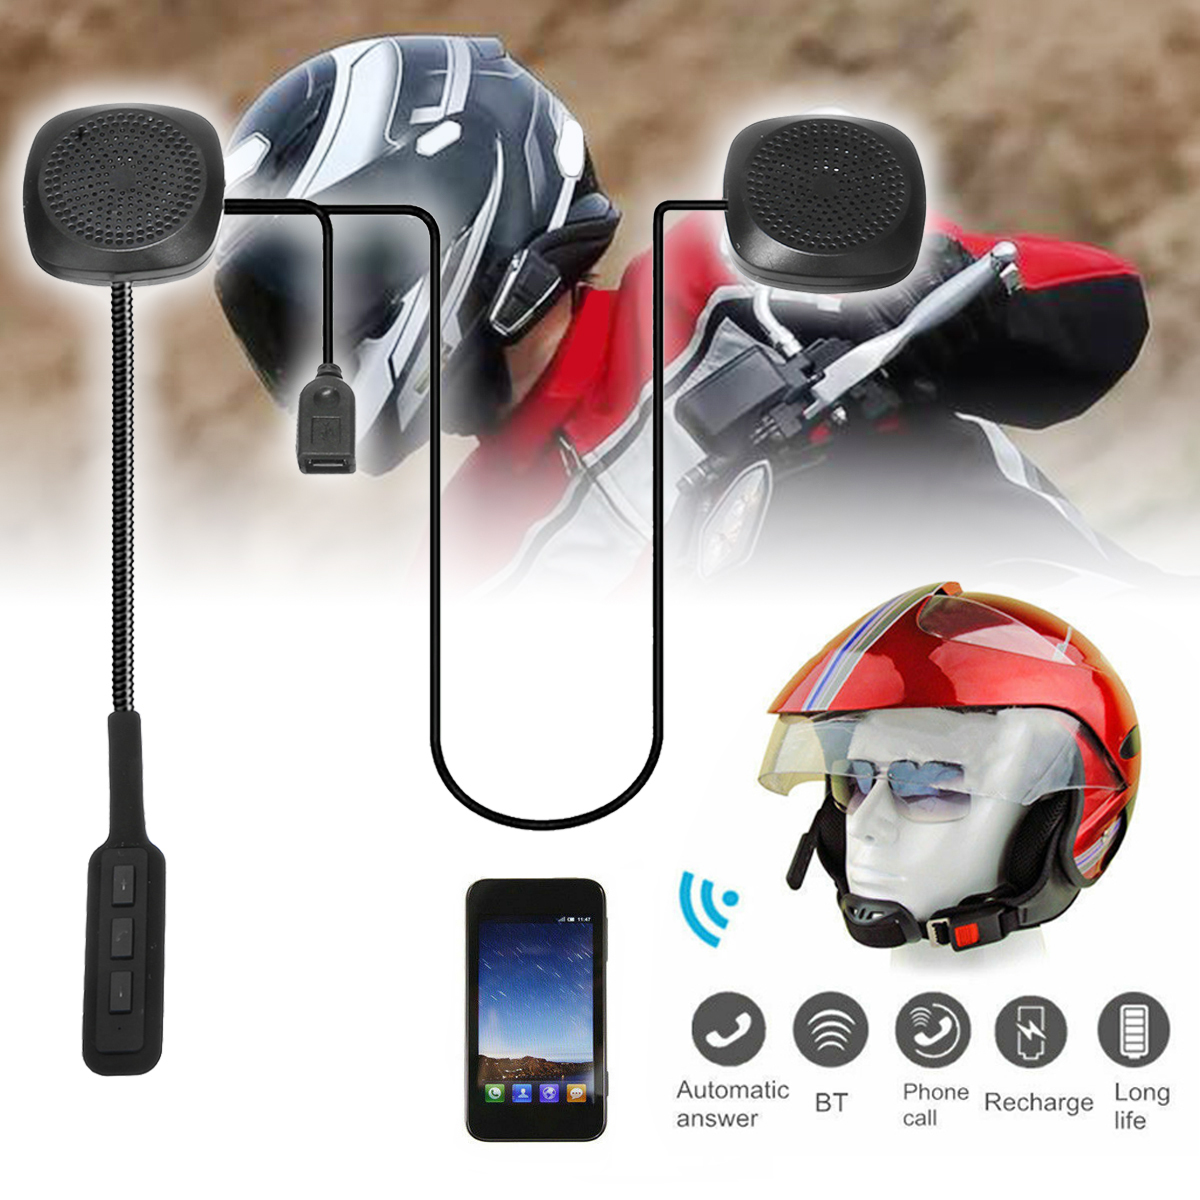 1SET DC5V Motorcycle Helmet Wireless Bluetooth Headset Speaker Stereo Headphone Handsfree Music Support A2dp Avctp Avdtp L2cap